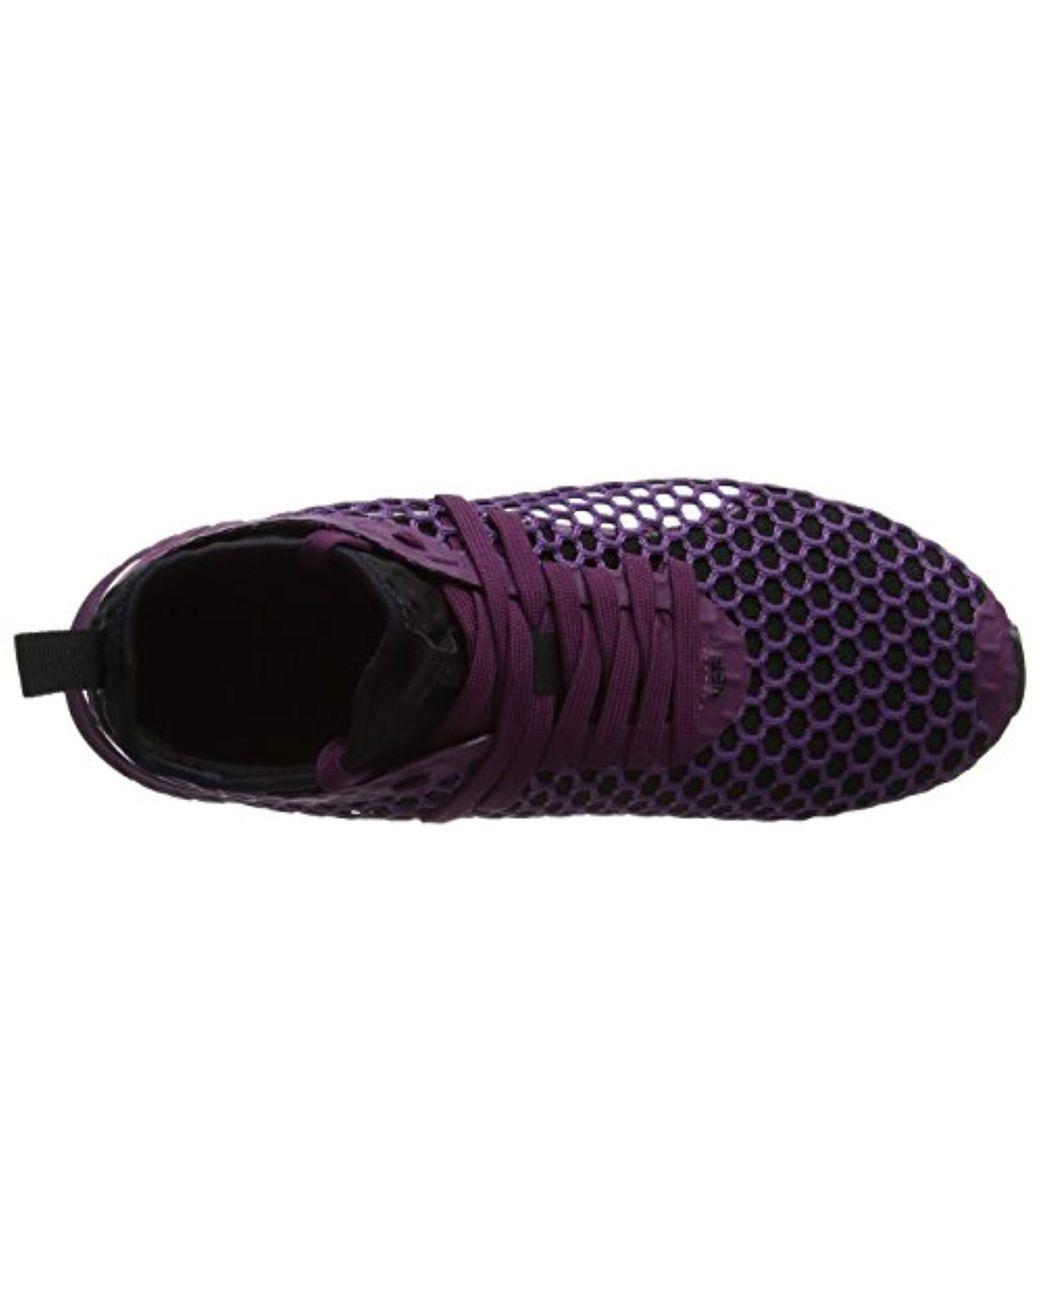 Coloris Ignite Femme NetfitChaussures Dual De Violet Running 0NOm8wnv